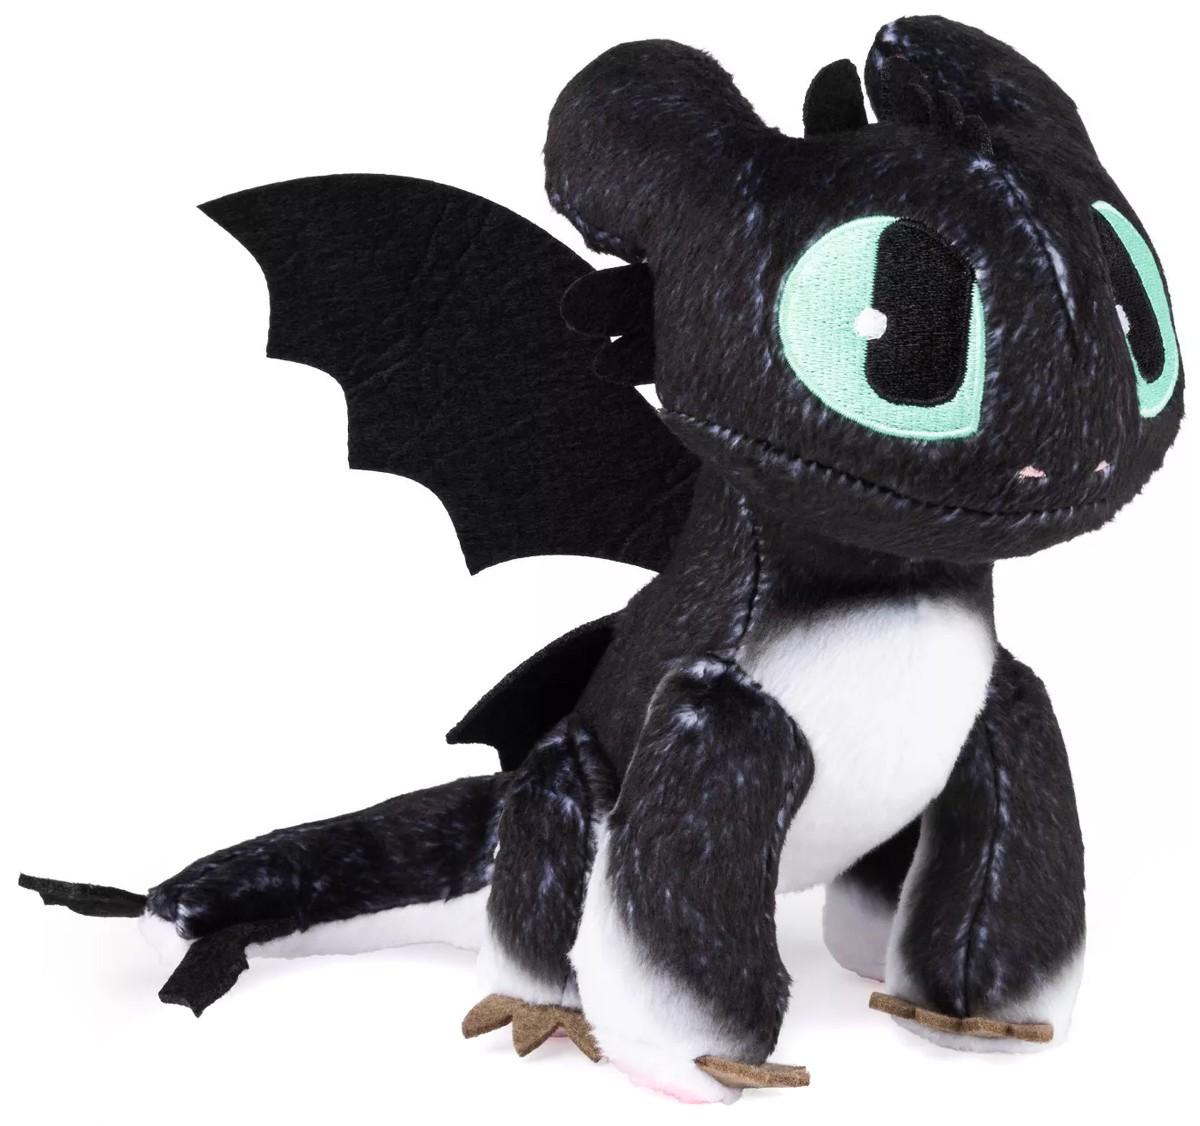 How to Train Your Dragon The Hidden World Nightlight 6.5-Inch Plush Blue Eyes